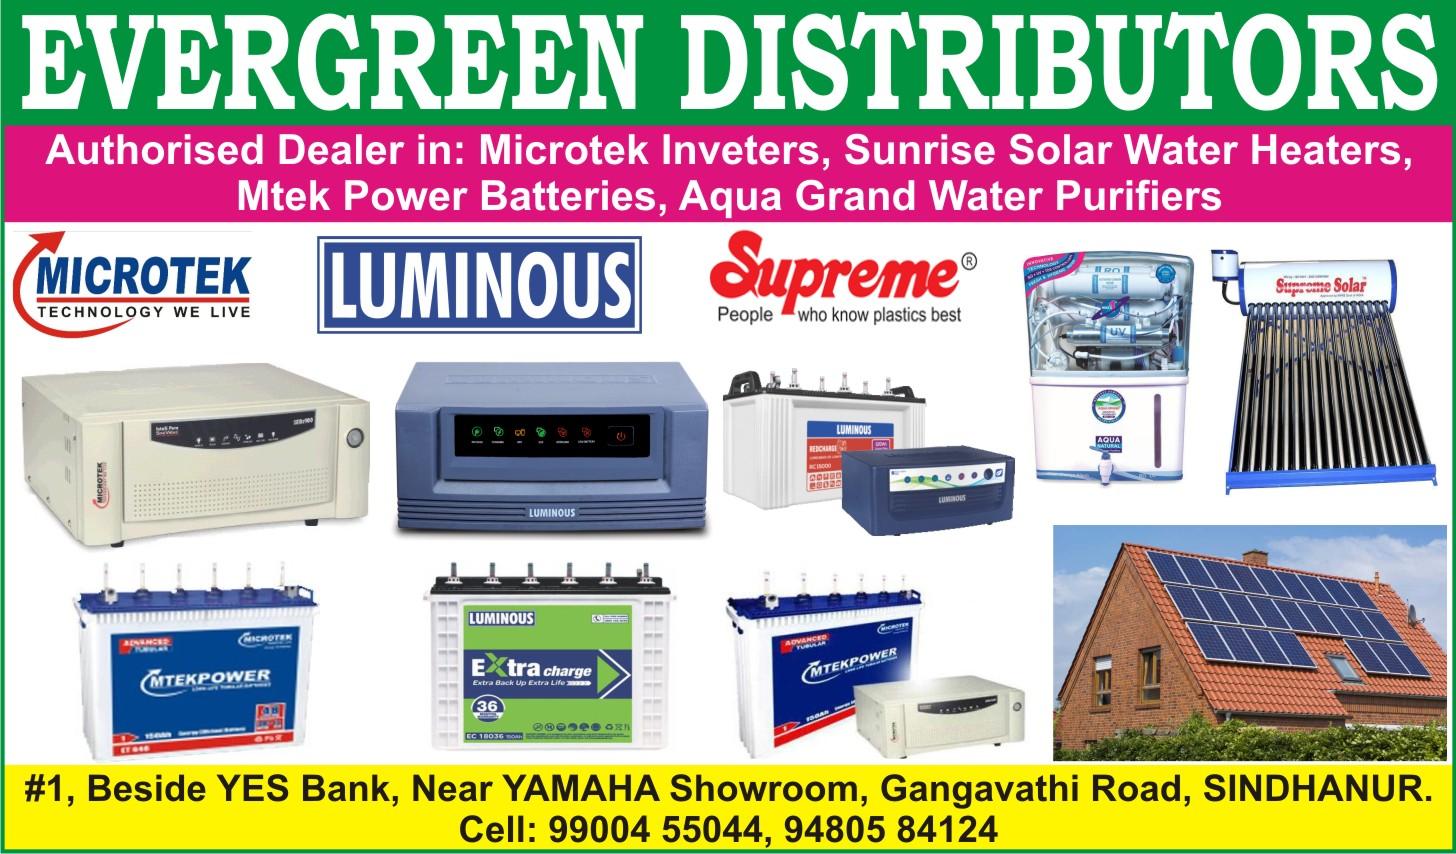 Evergreen Distributors